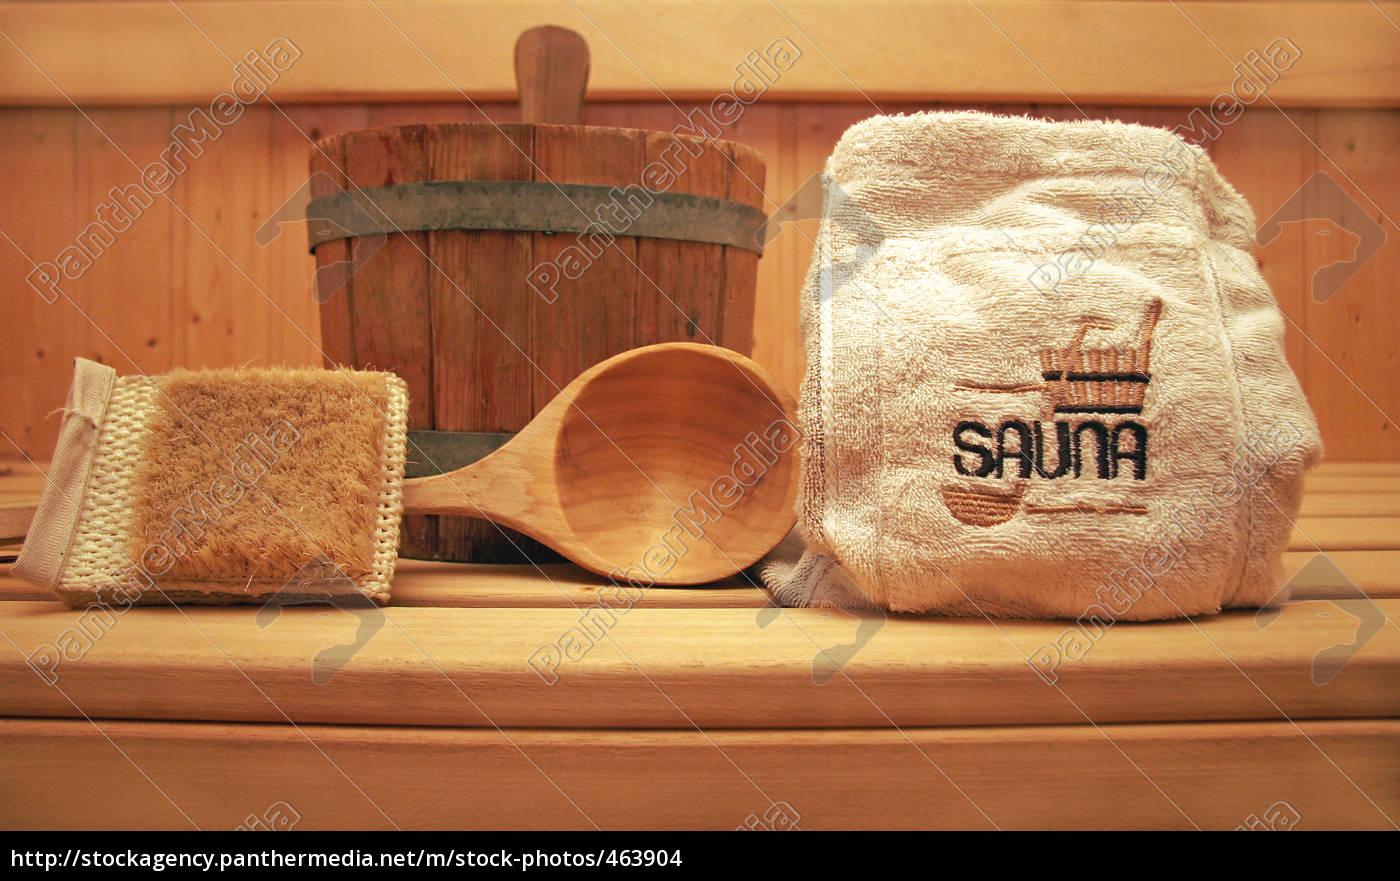 sauna, utensils - 463904